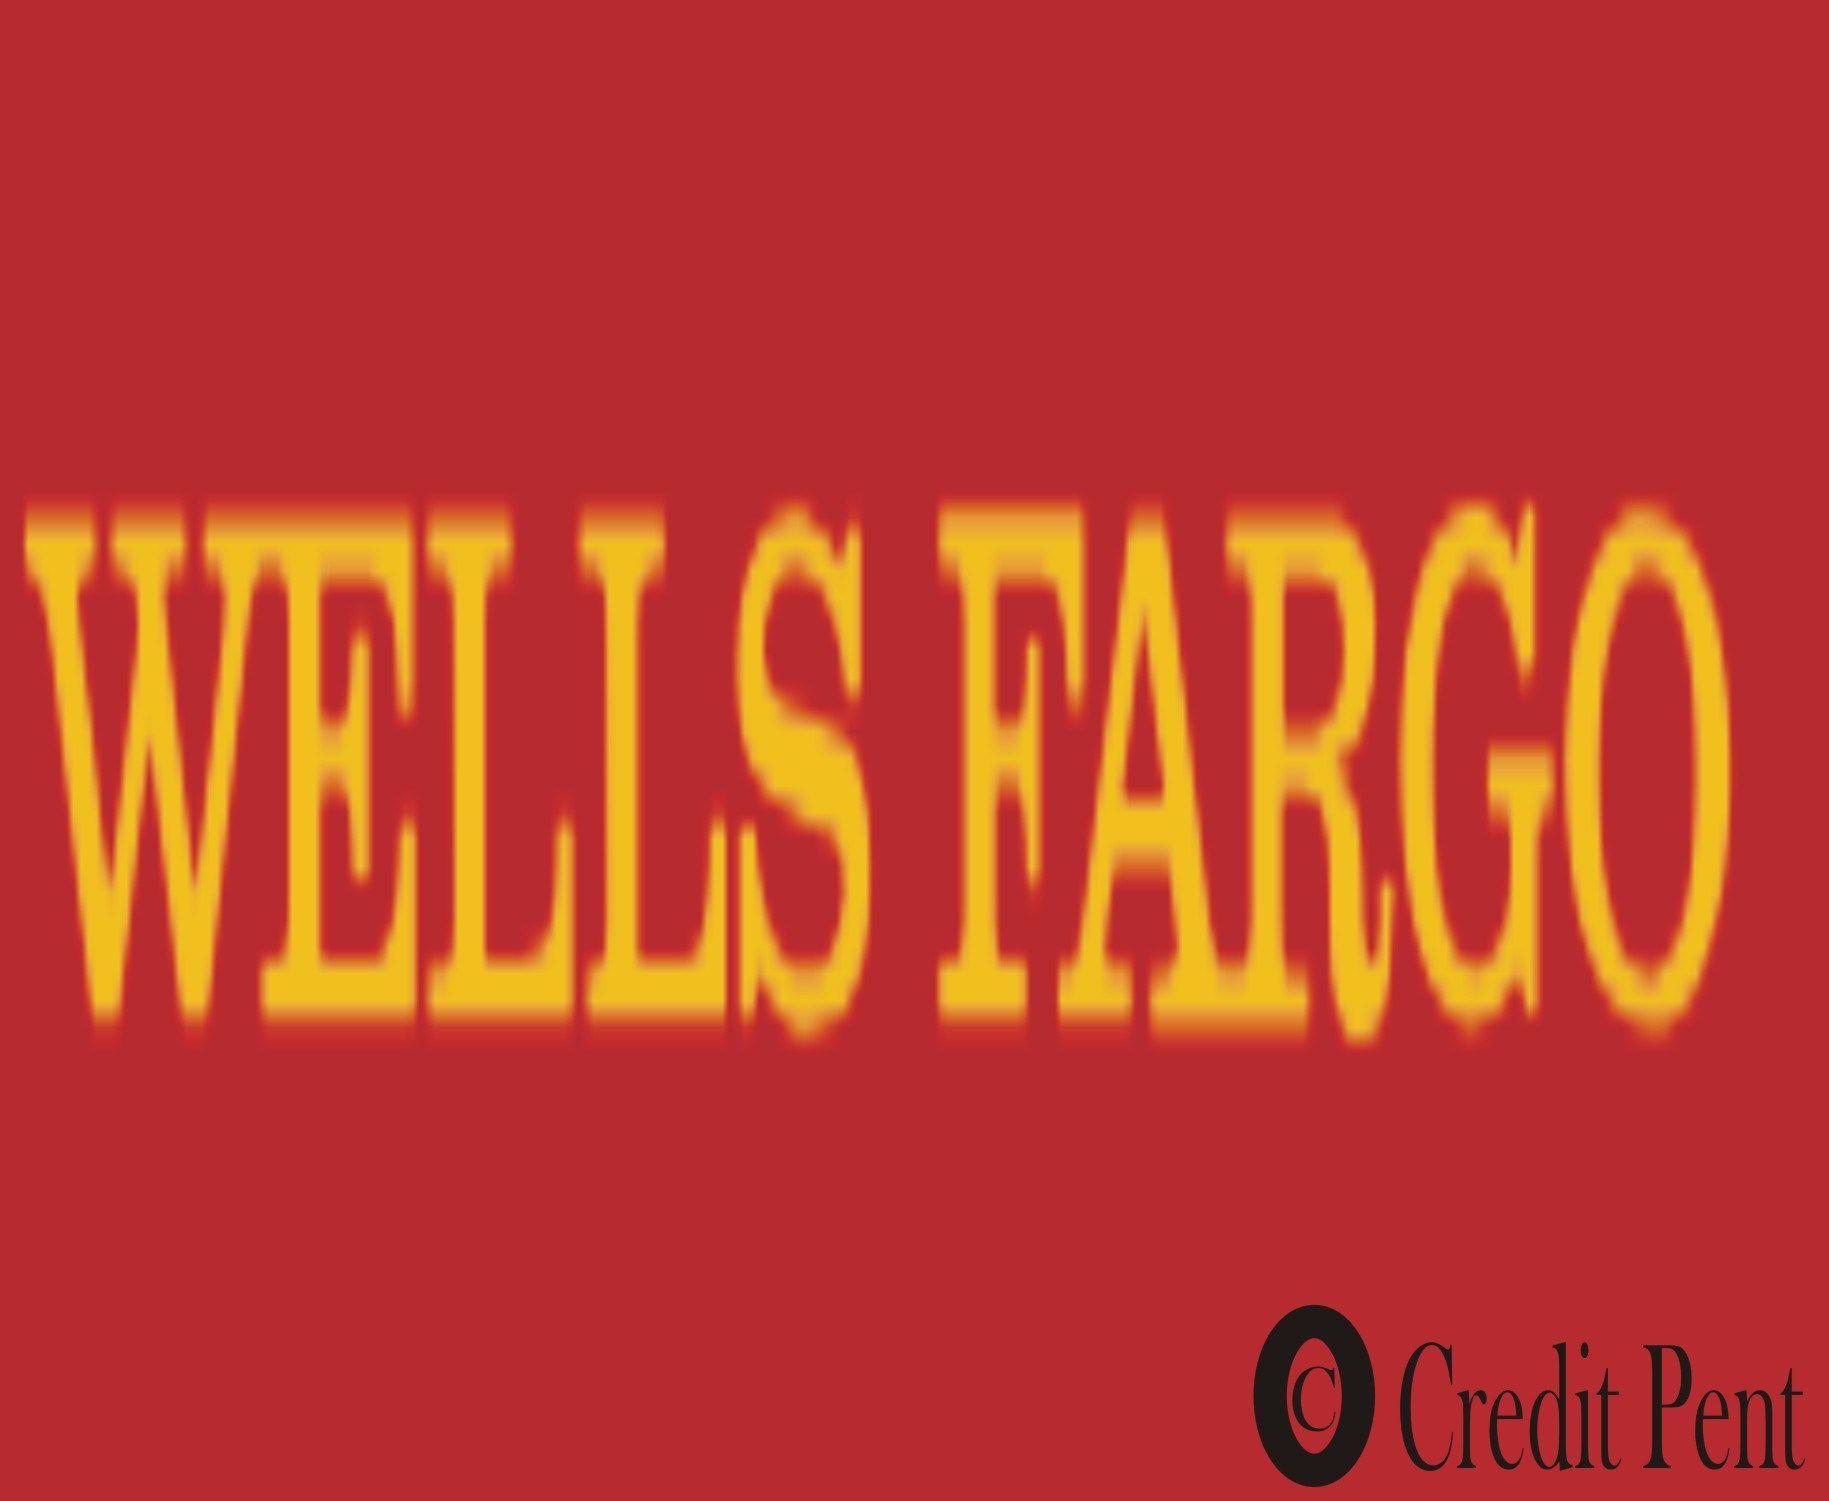 wells fargo health advantage credit card account payment